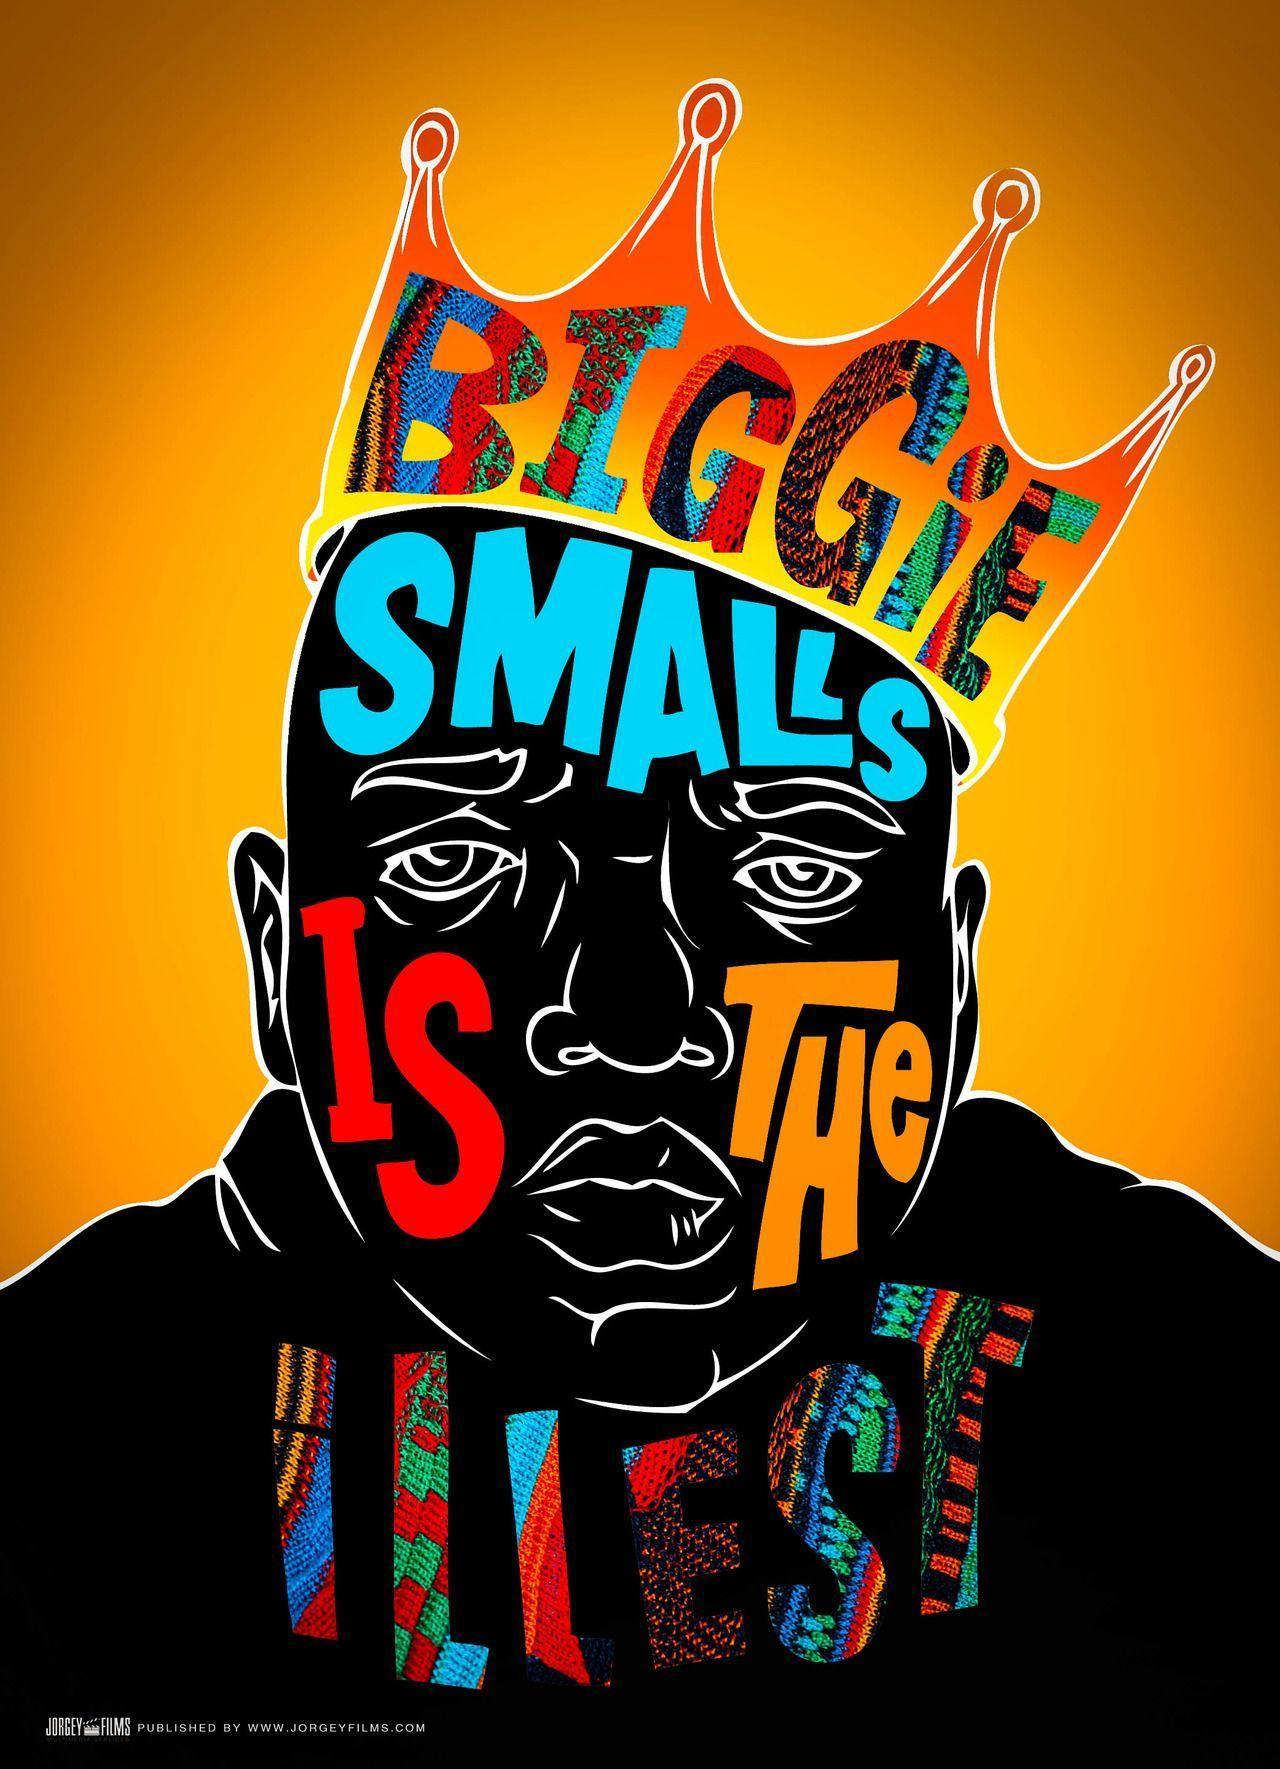 Biggie Smalls Wallpapers Top Free Biggie Smalls